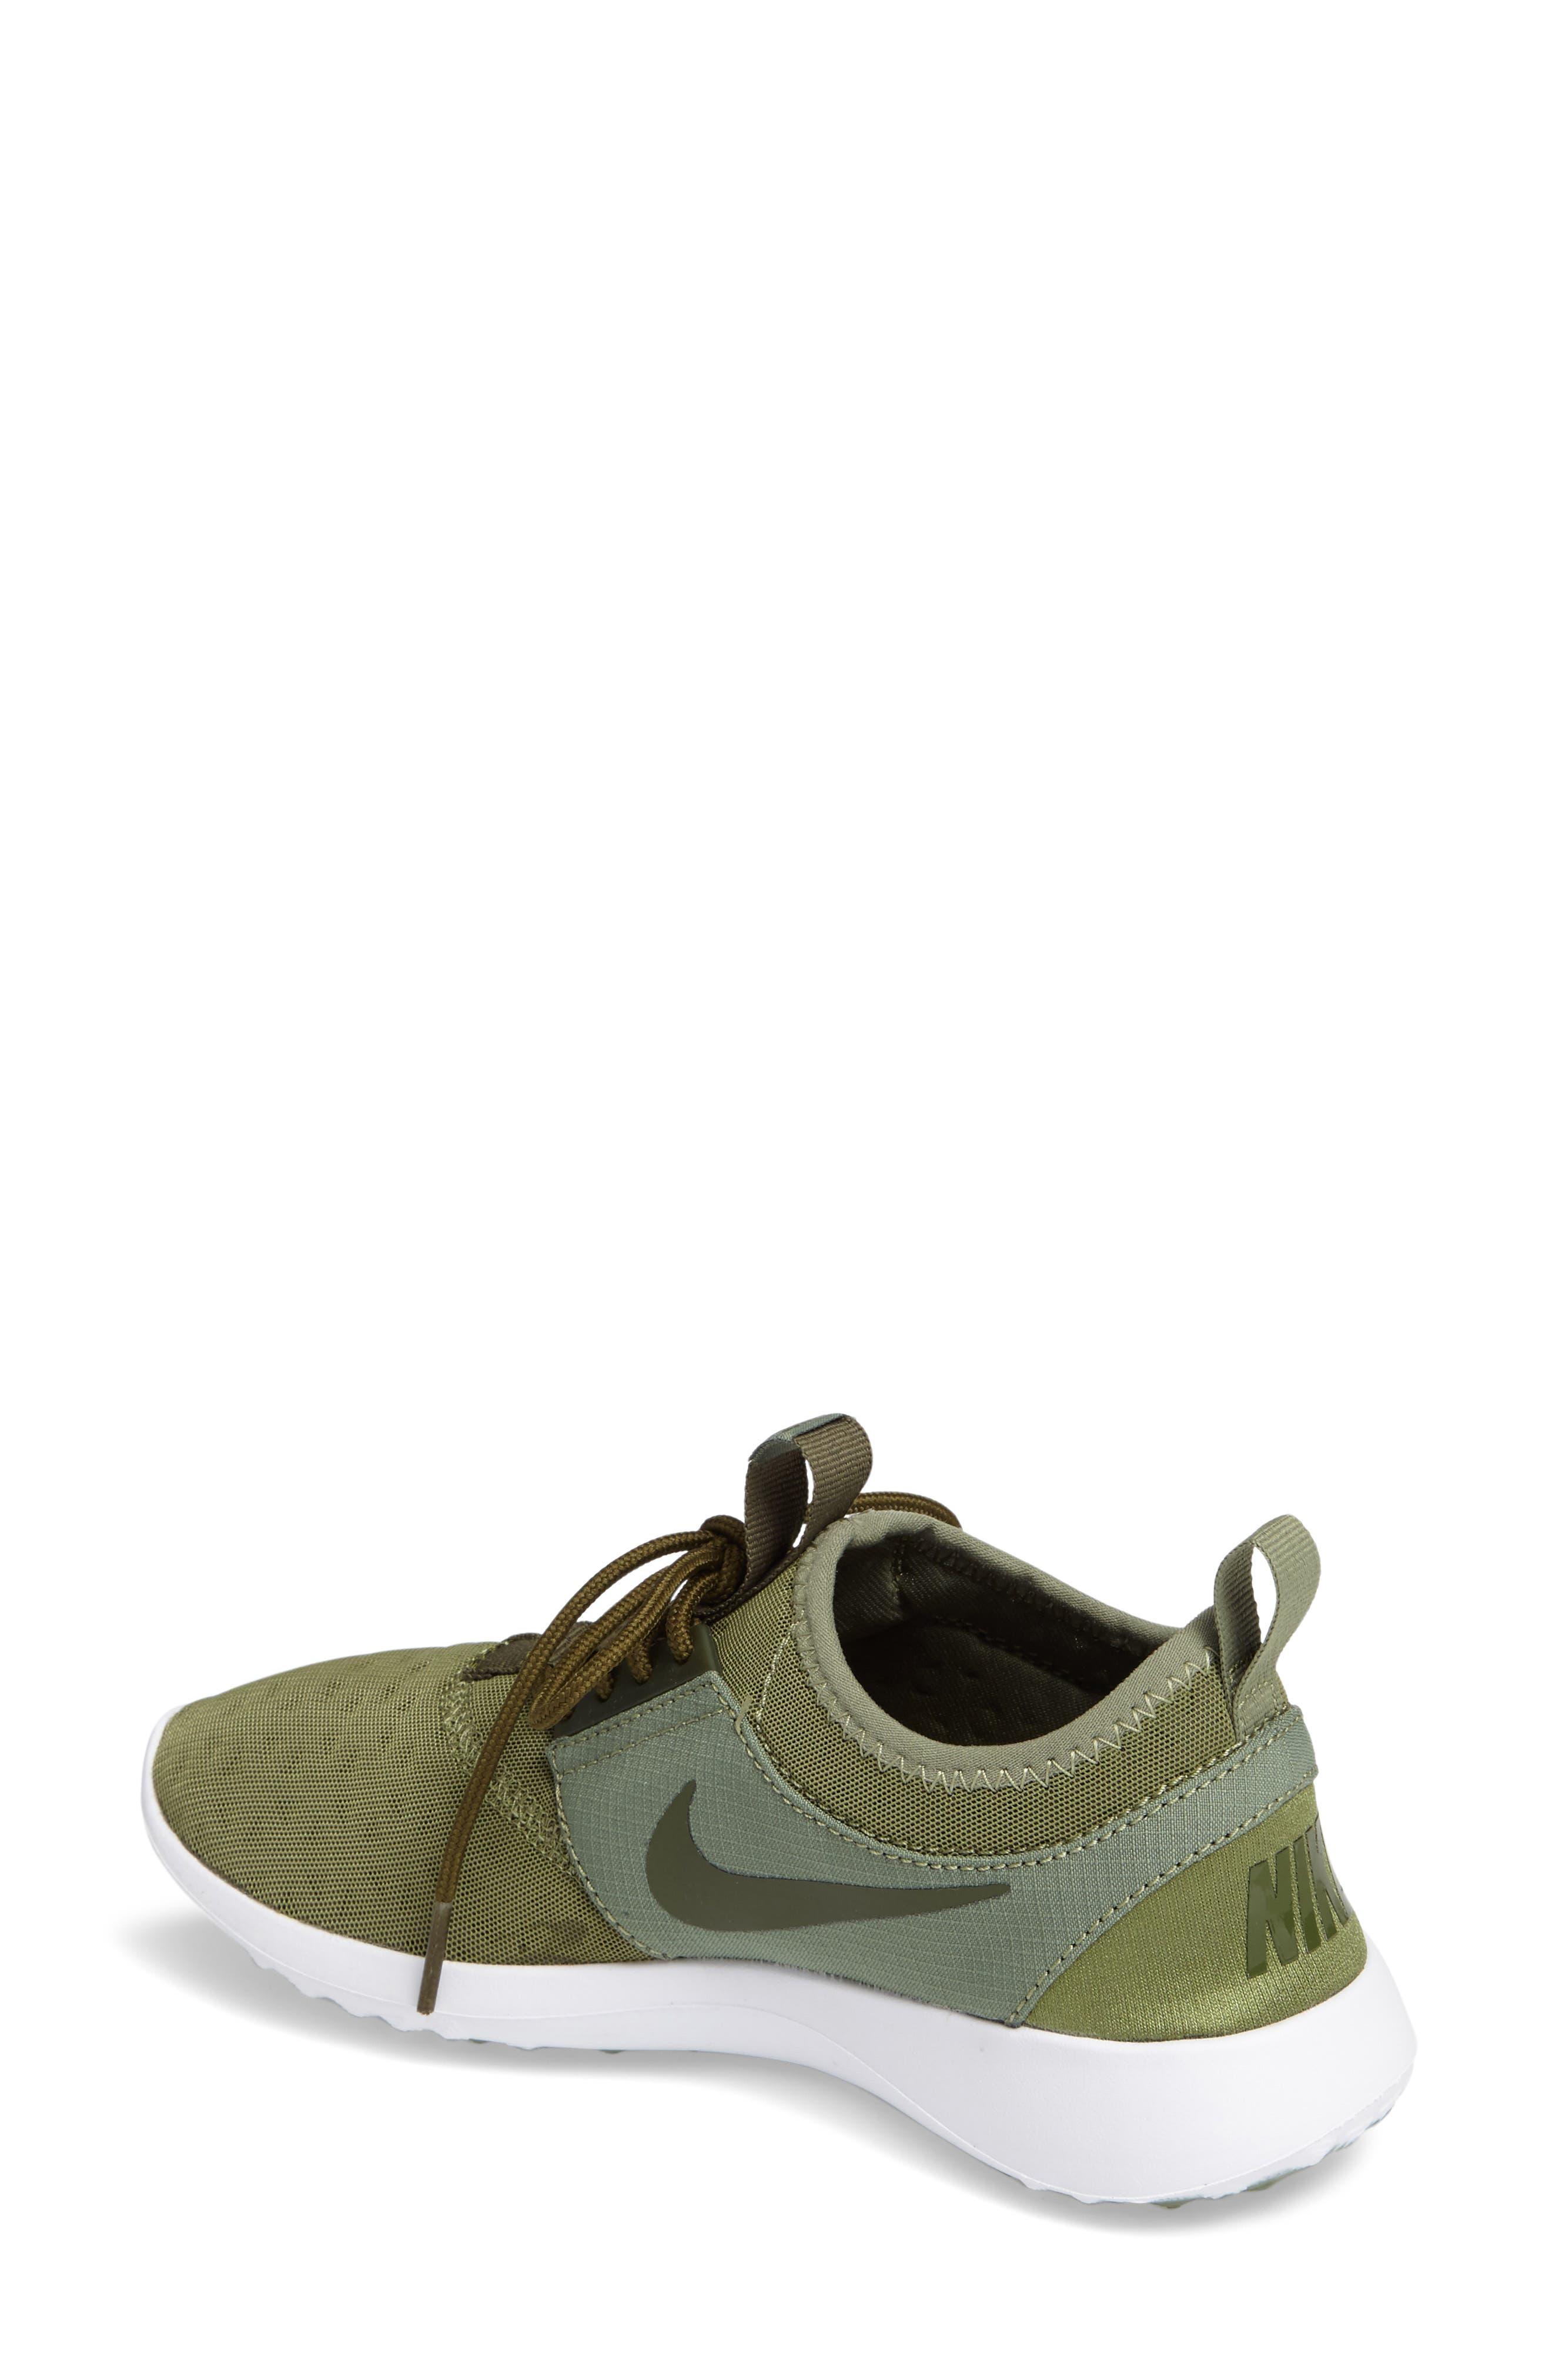 Juvenate Sneaker,                             Alternate thumbnail 93, color,